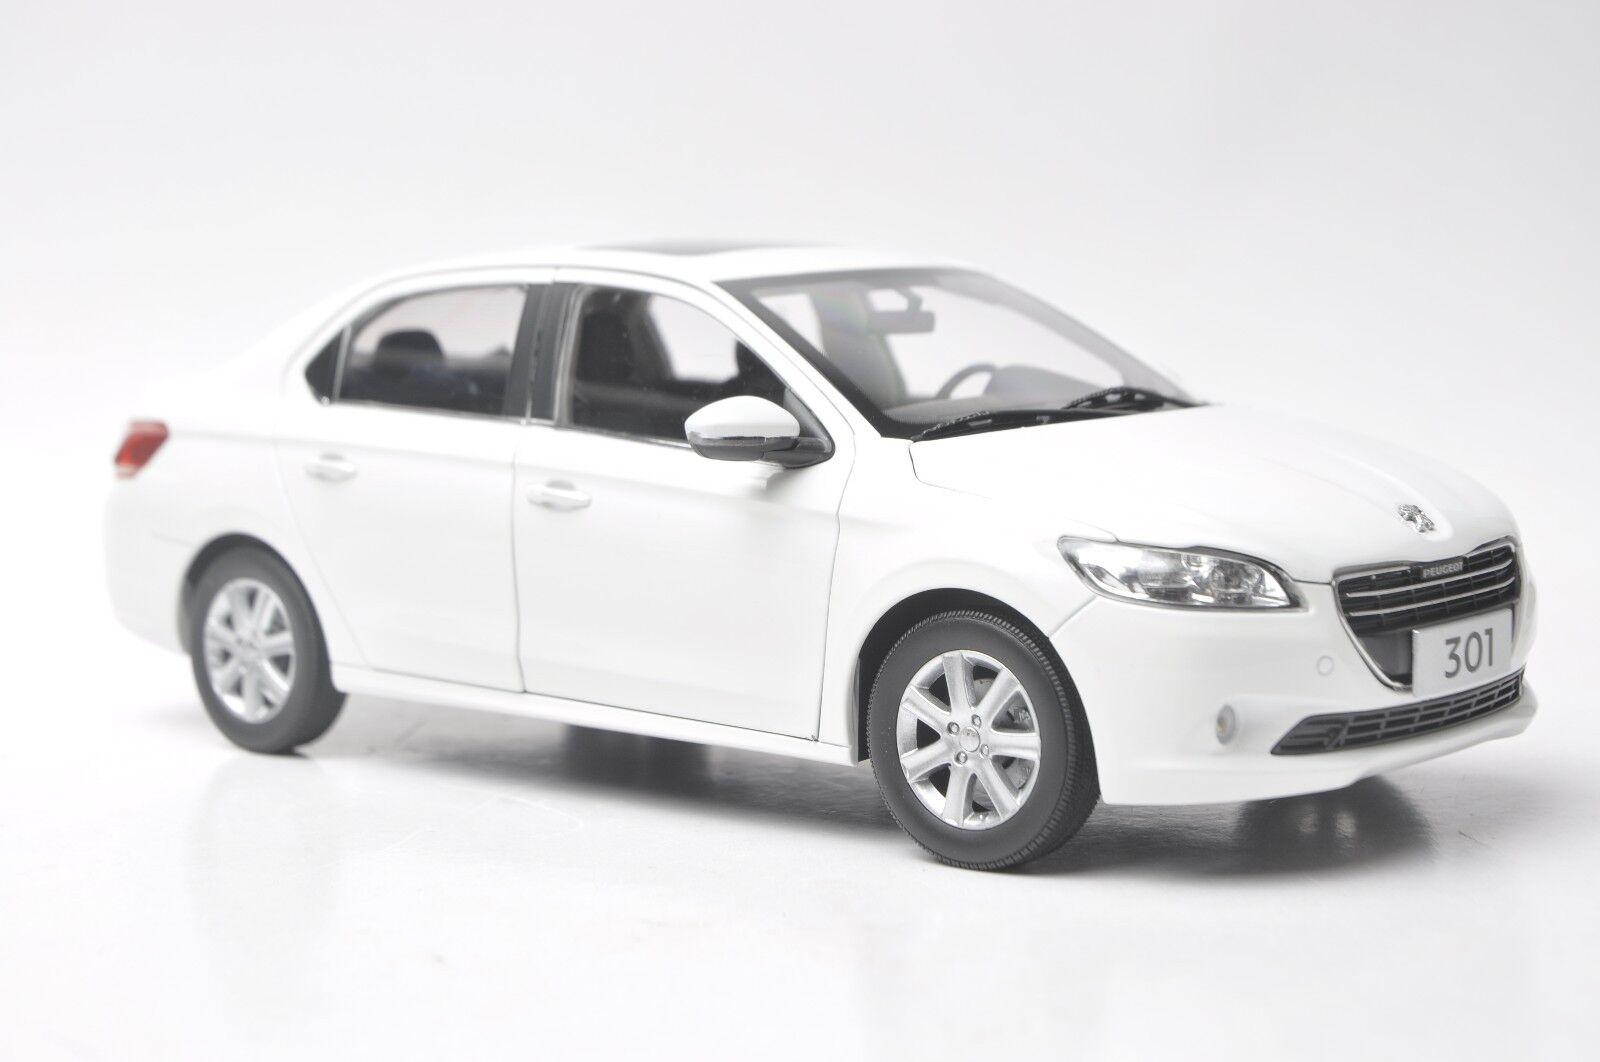 Peugeot 301 Sedan car model in scale 1 18 white